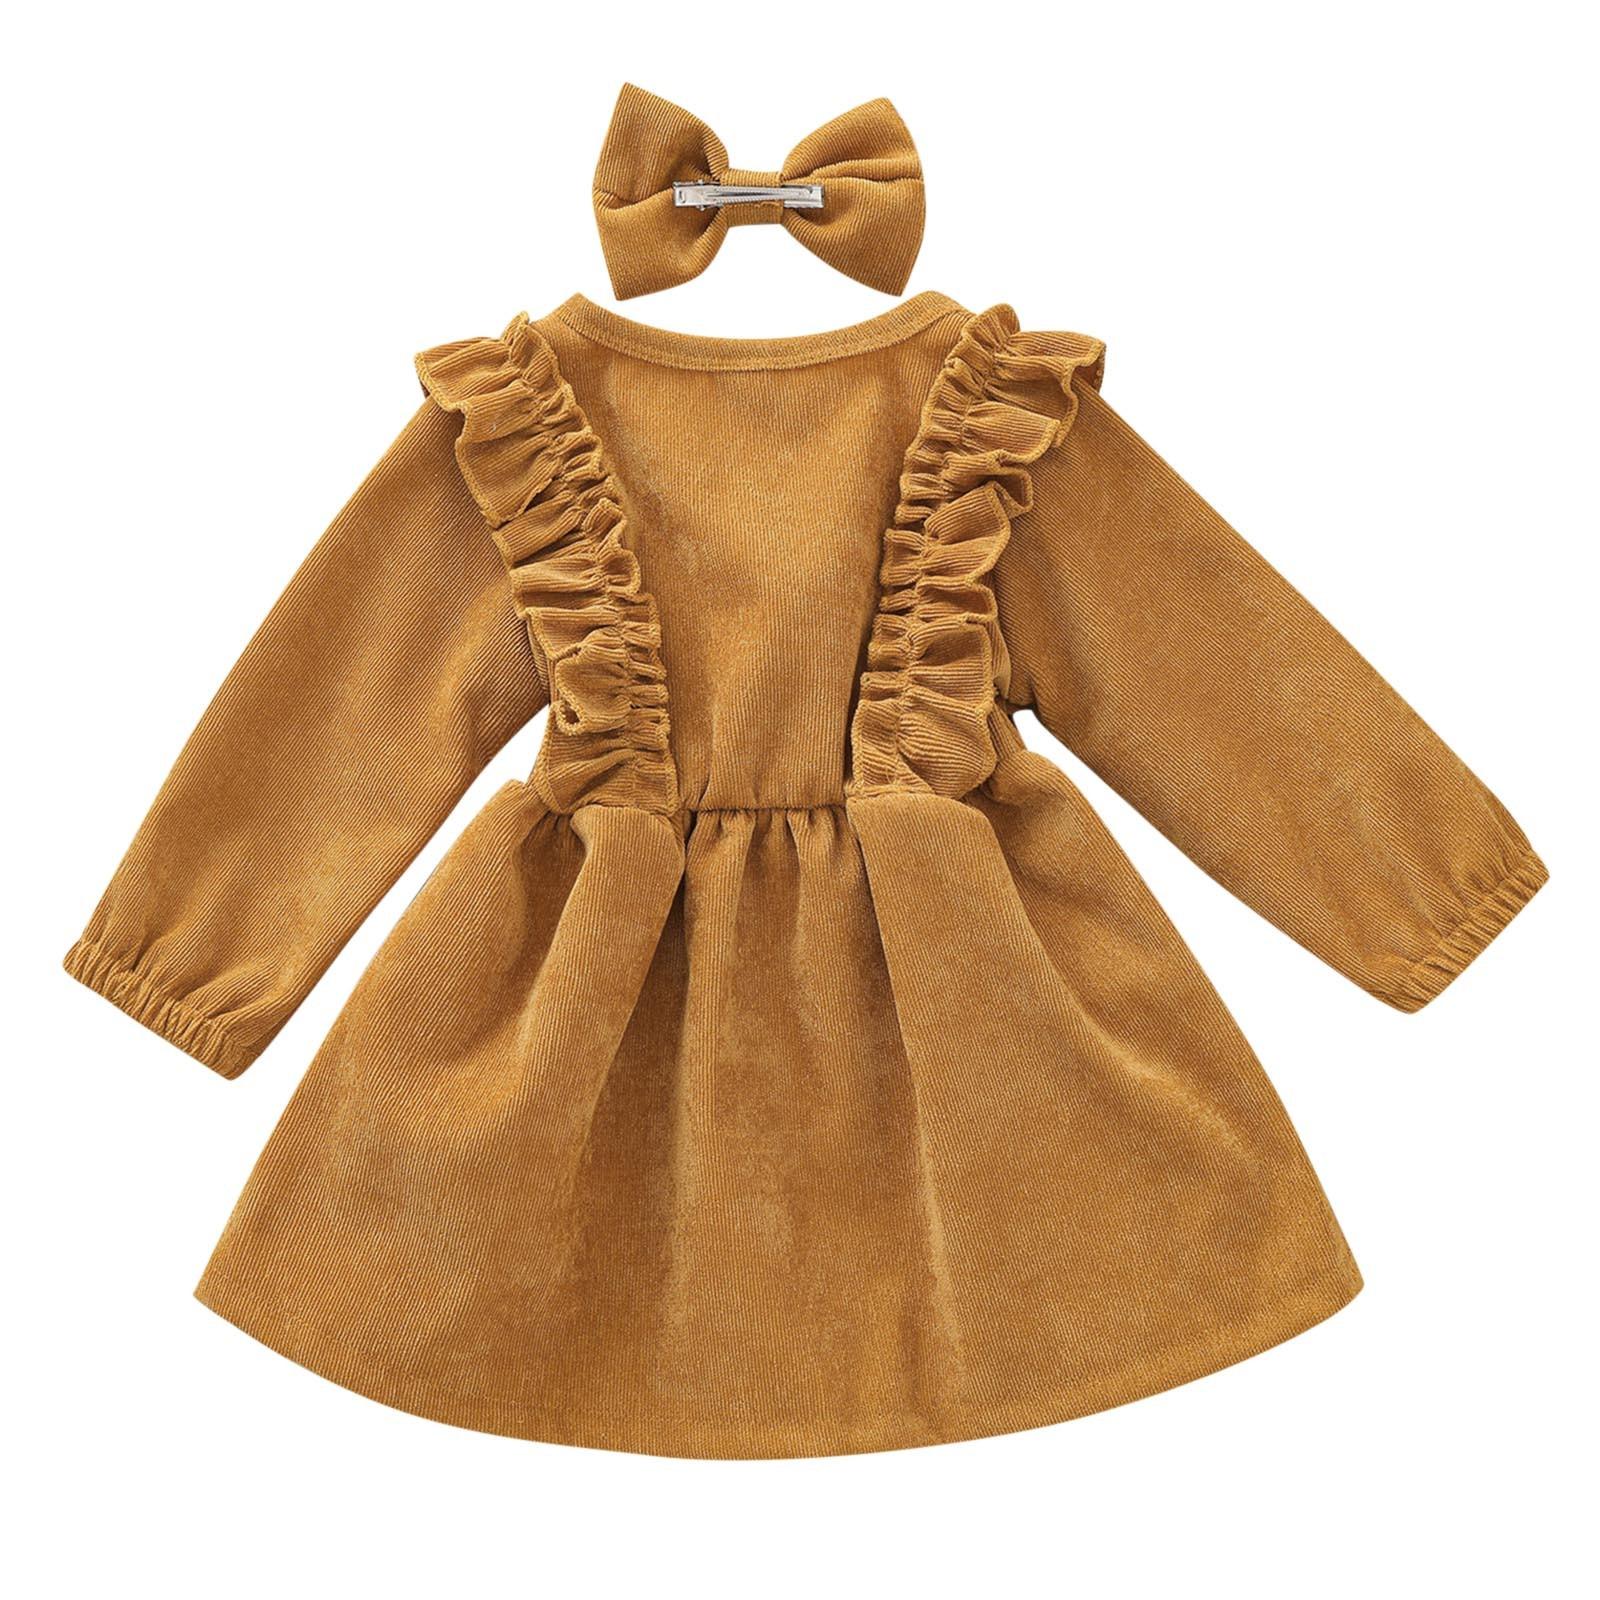 Quality Spring Design Child Long Sleeve Corduroy Ruffle Twril Dresses Toddler Brown Solid Tutu Dress Little Girl Winter Dress